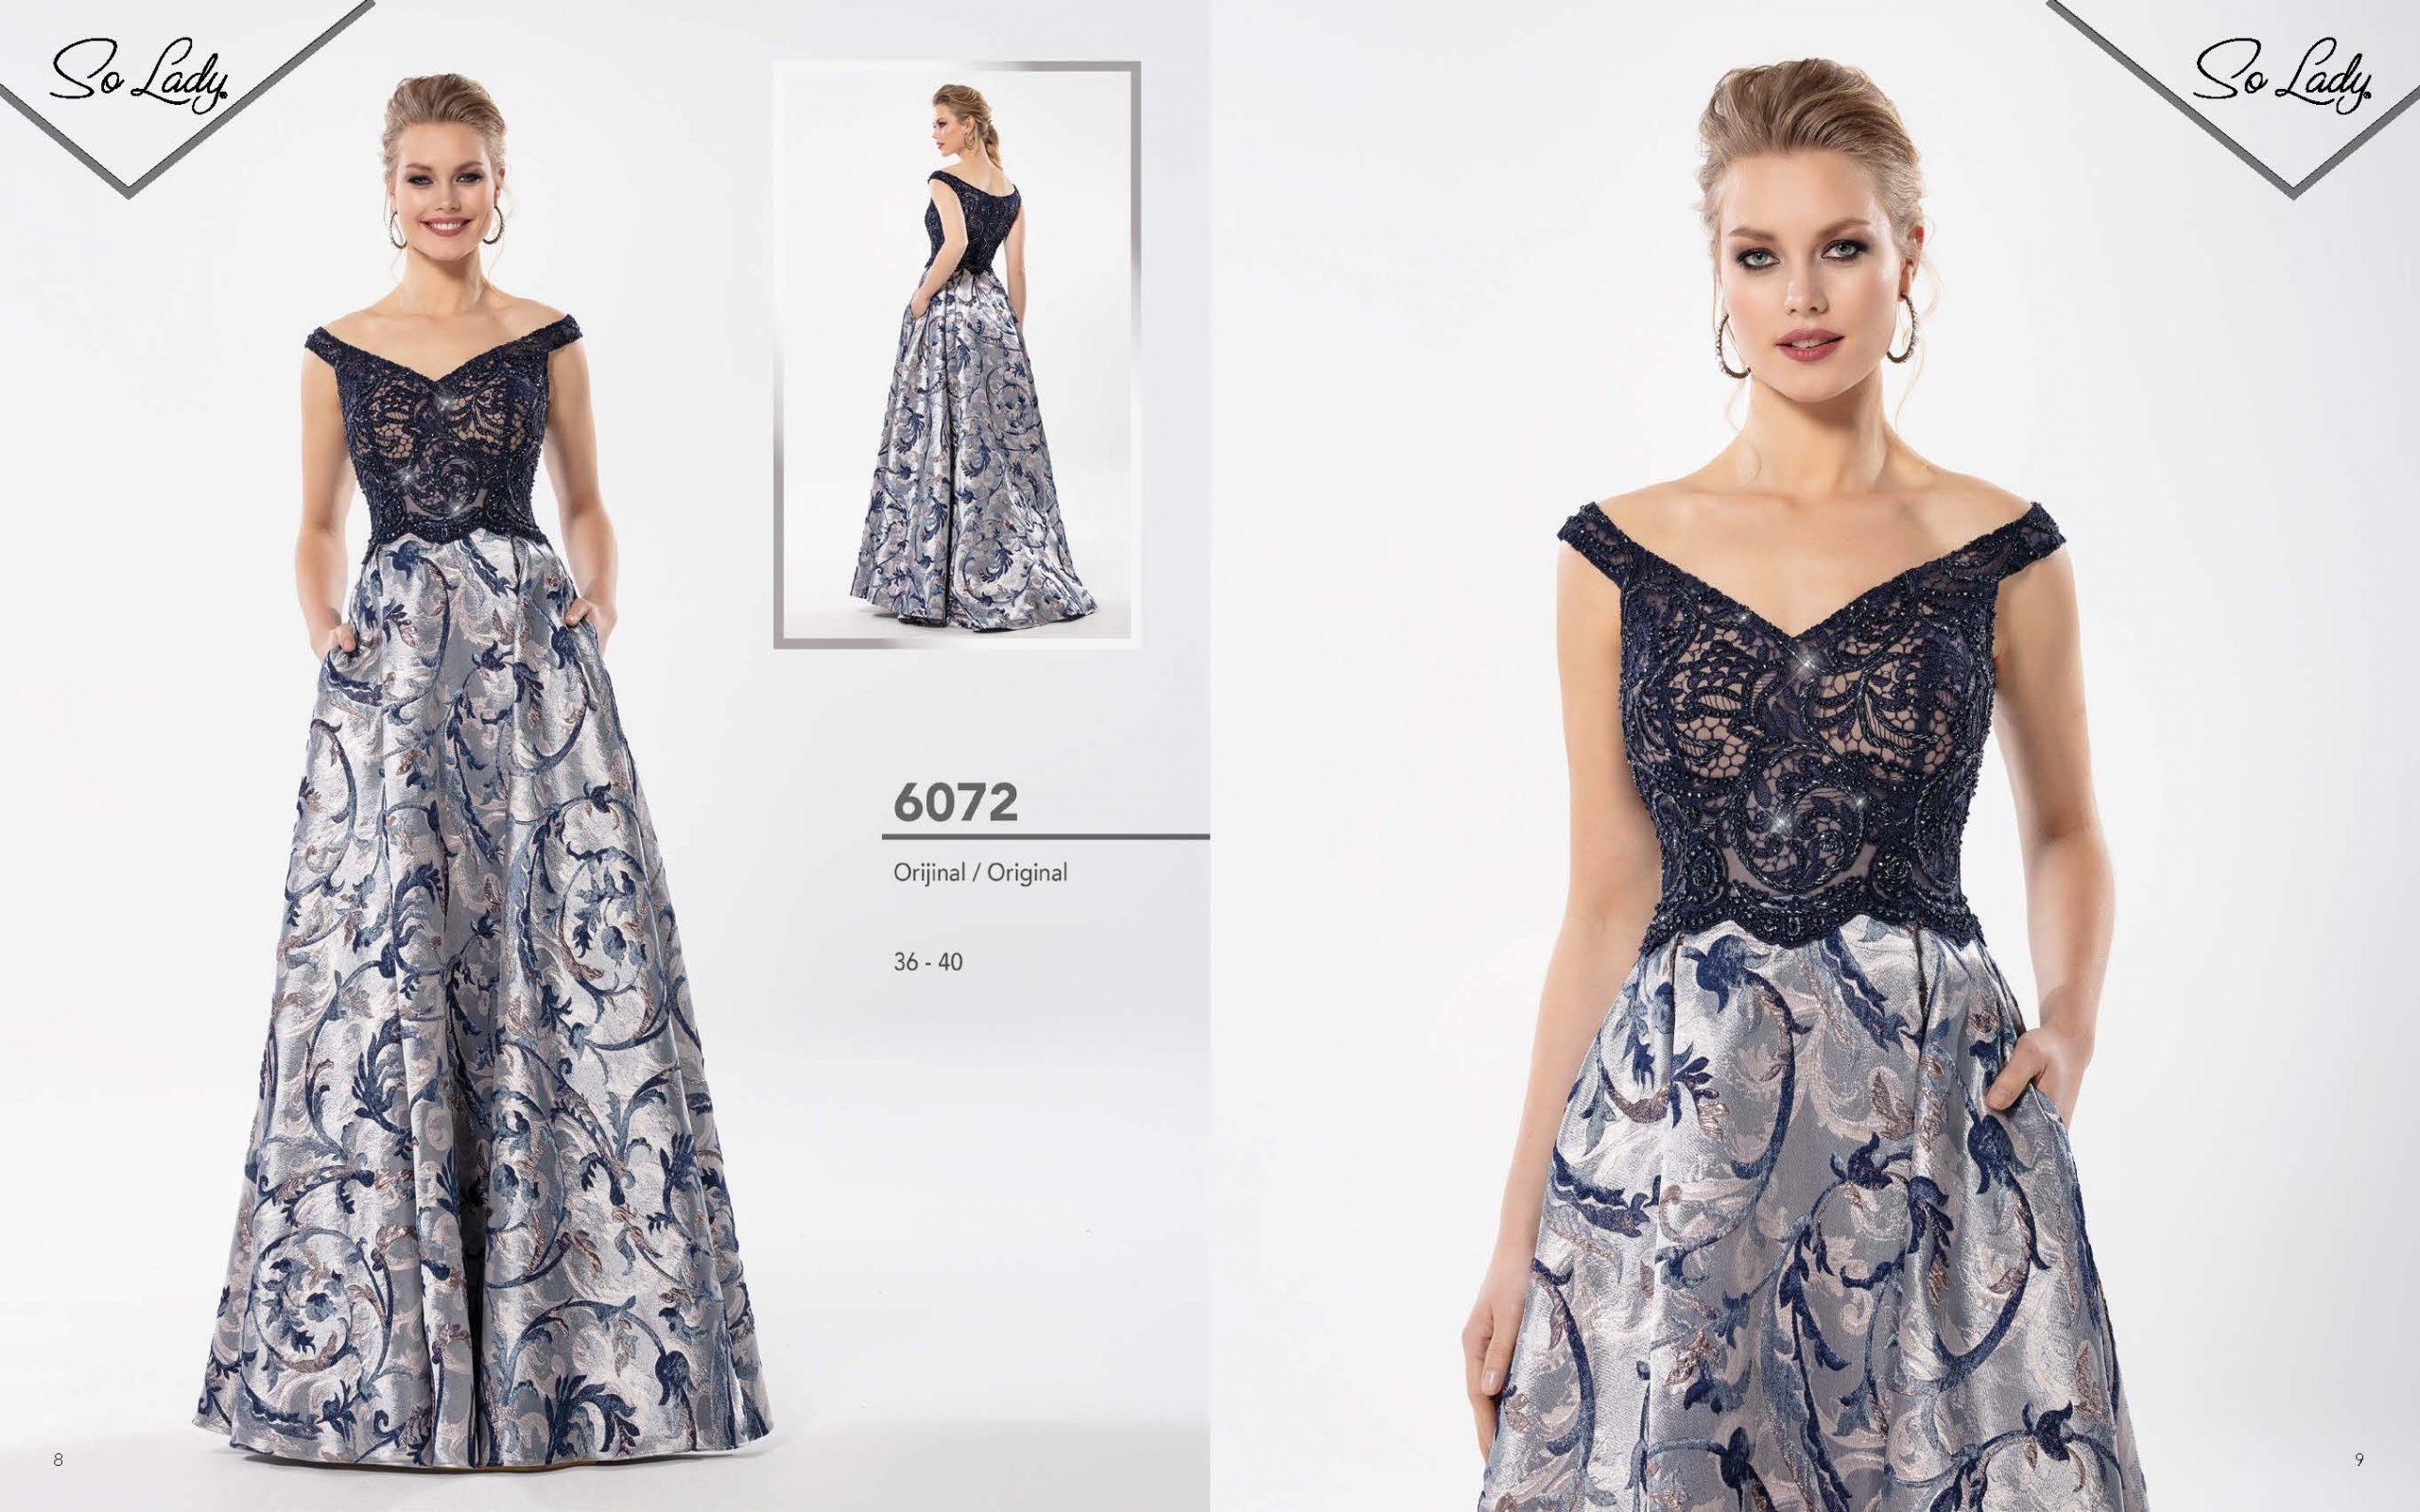 10 Spektakulär Abendkleider Nürnberg Stylish13 Perfekt Abendkleider Nürnberg Spezialgebiet